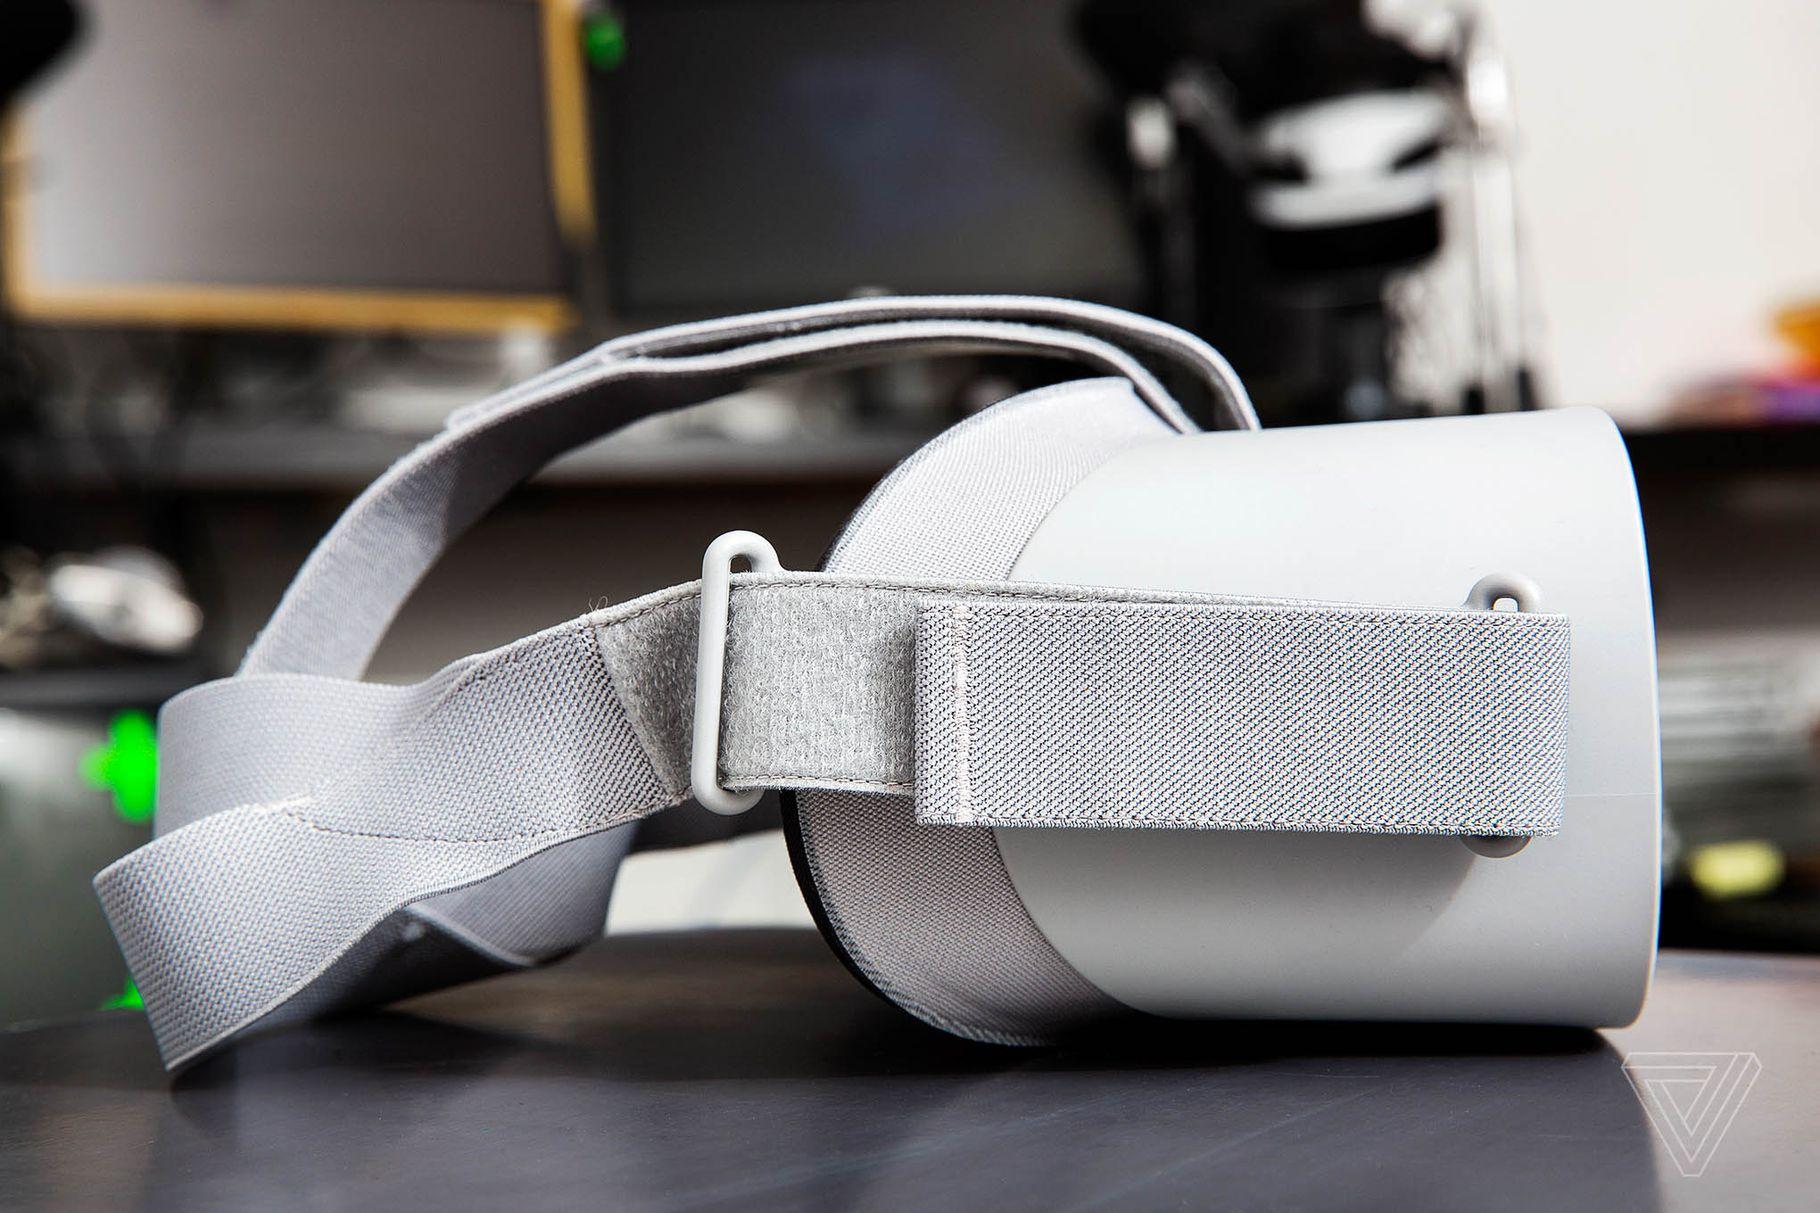 Facebook giới thiệu thiết bị đeo VR Oculus Go giá từ 199 USD